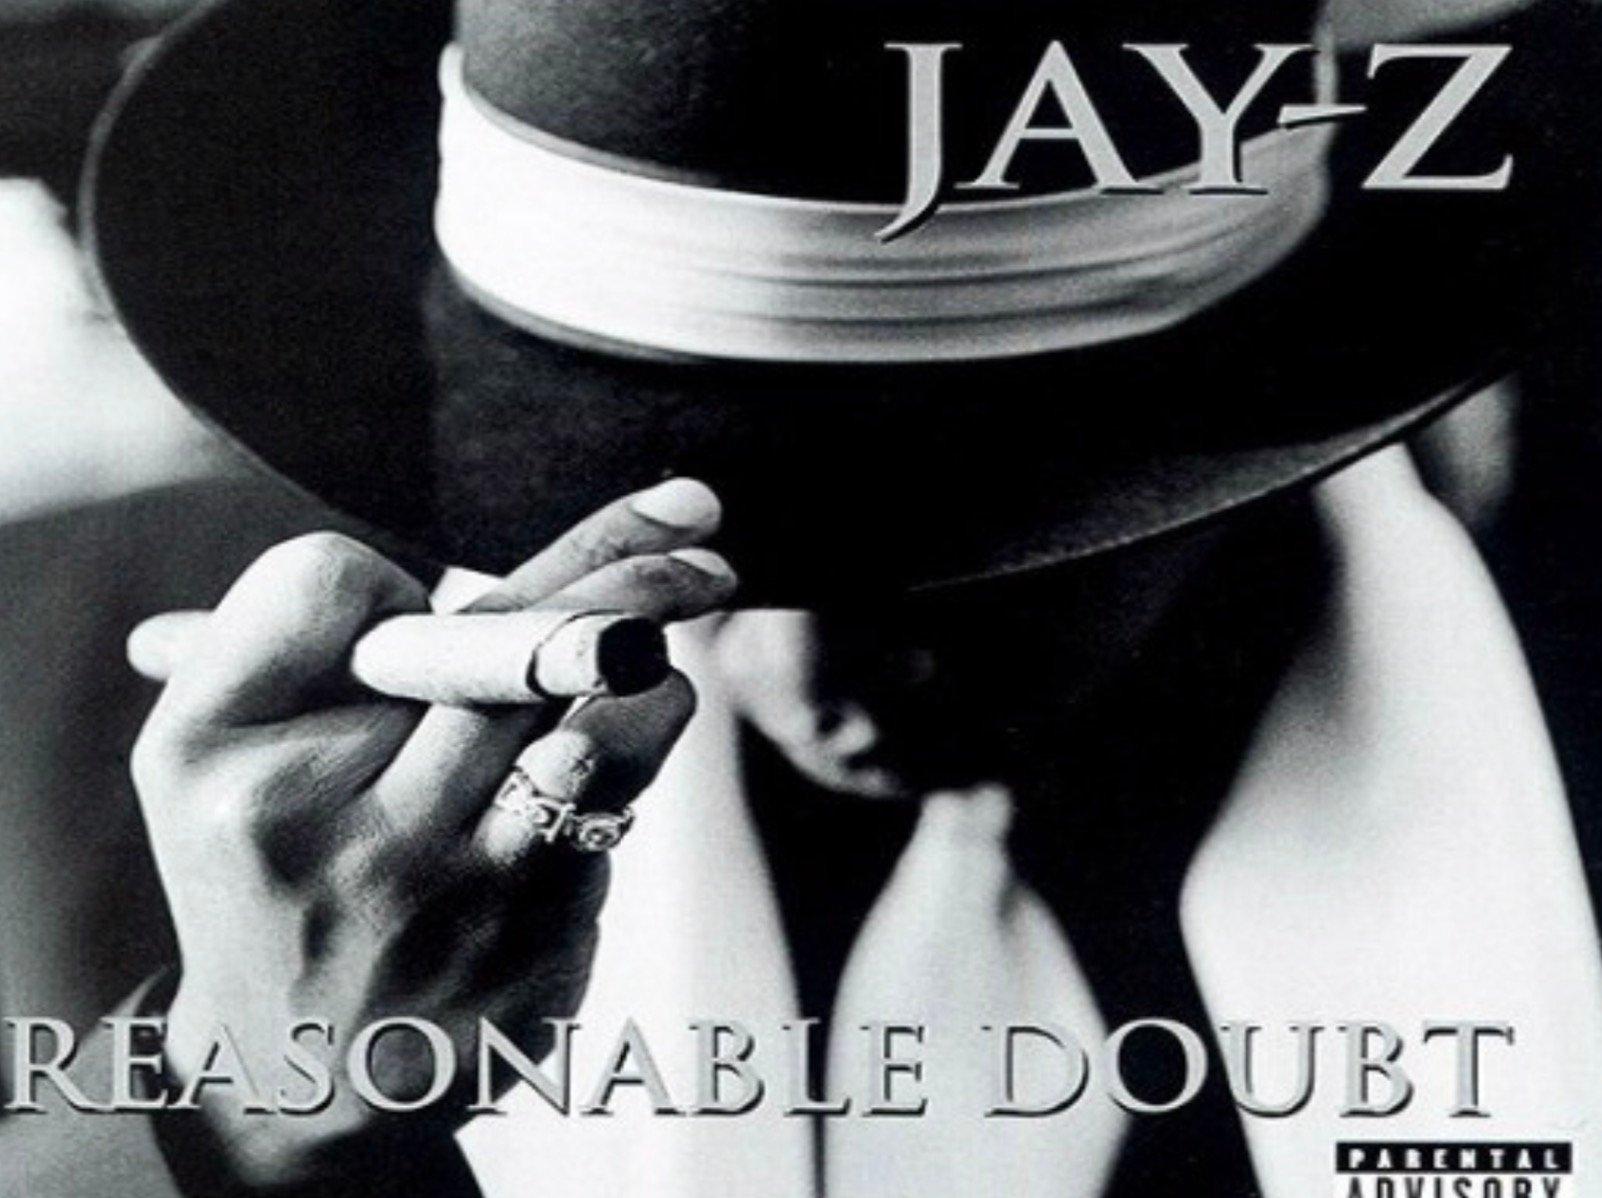 JAY-Z Reasonable Doubt